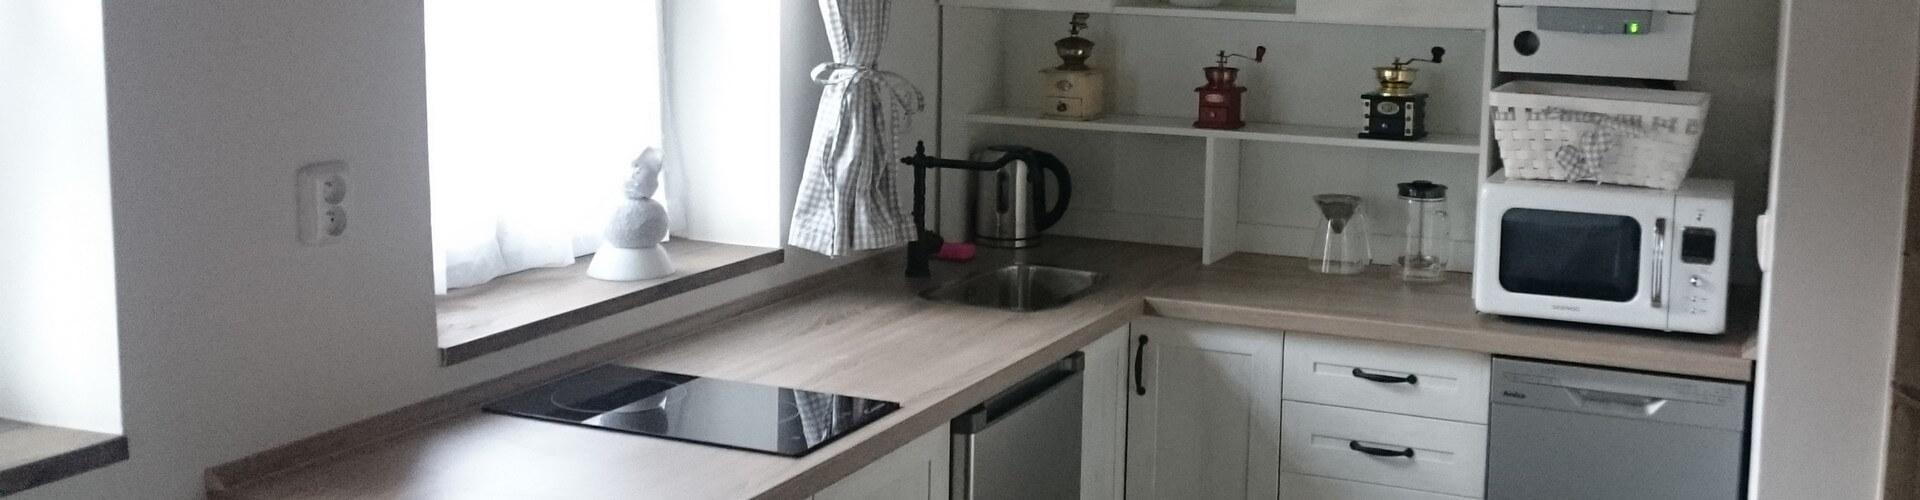 Apartmány - Kuchyň 2